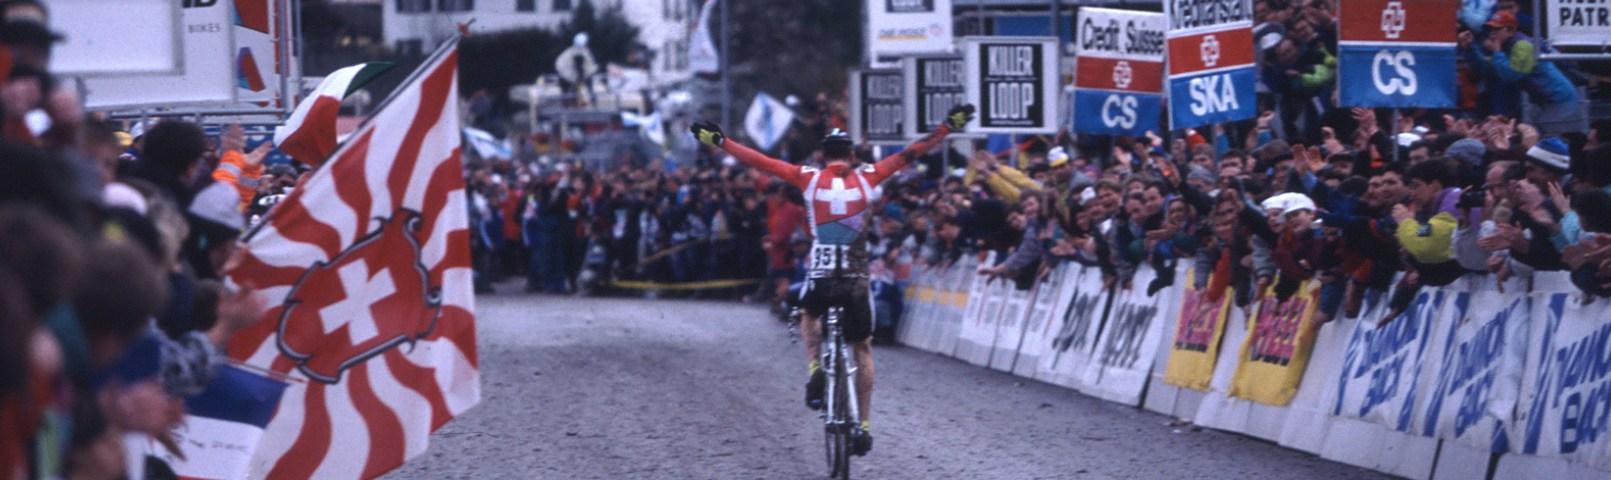 Dieter Runkel wins 1995 World Championships